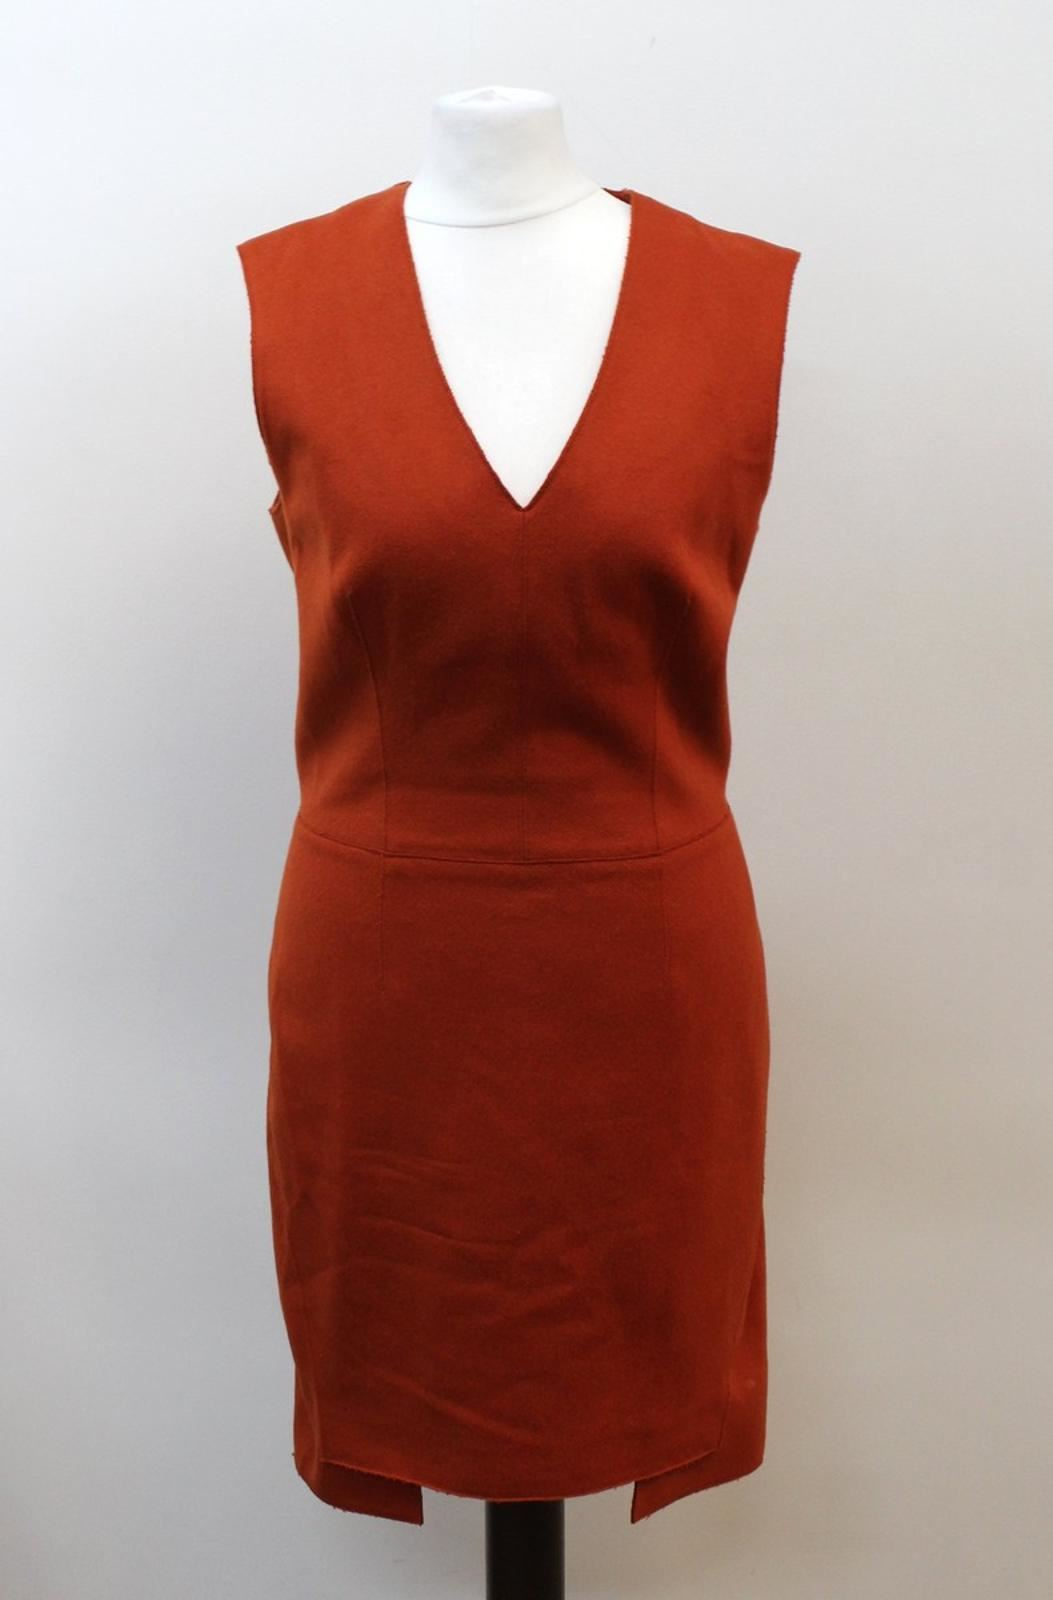 FARHI-NICOLE-FARHI-Ladies-Orange-Wool-Blend-Sleeveless-V-Neck-Dress-UK10-EU38